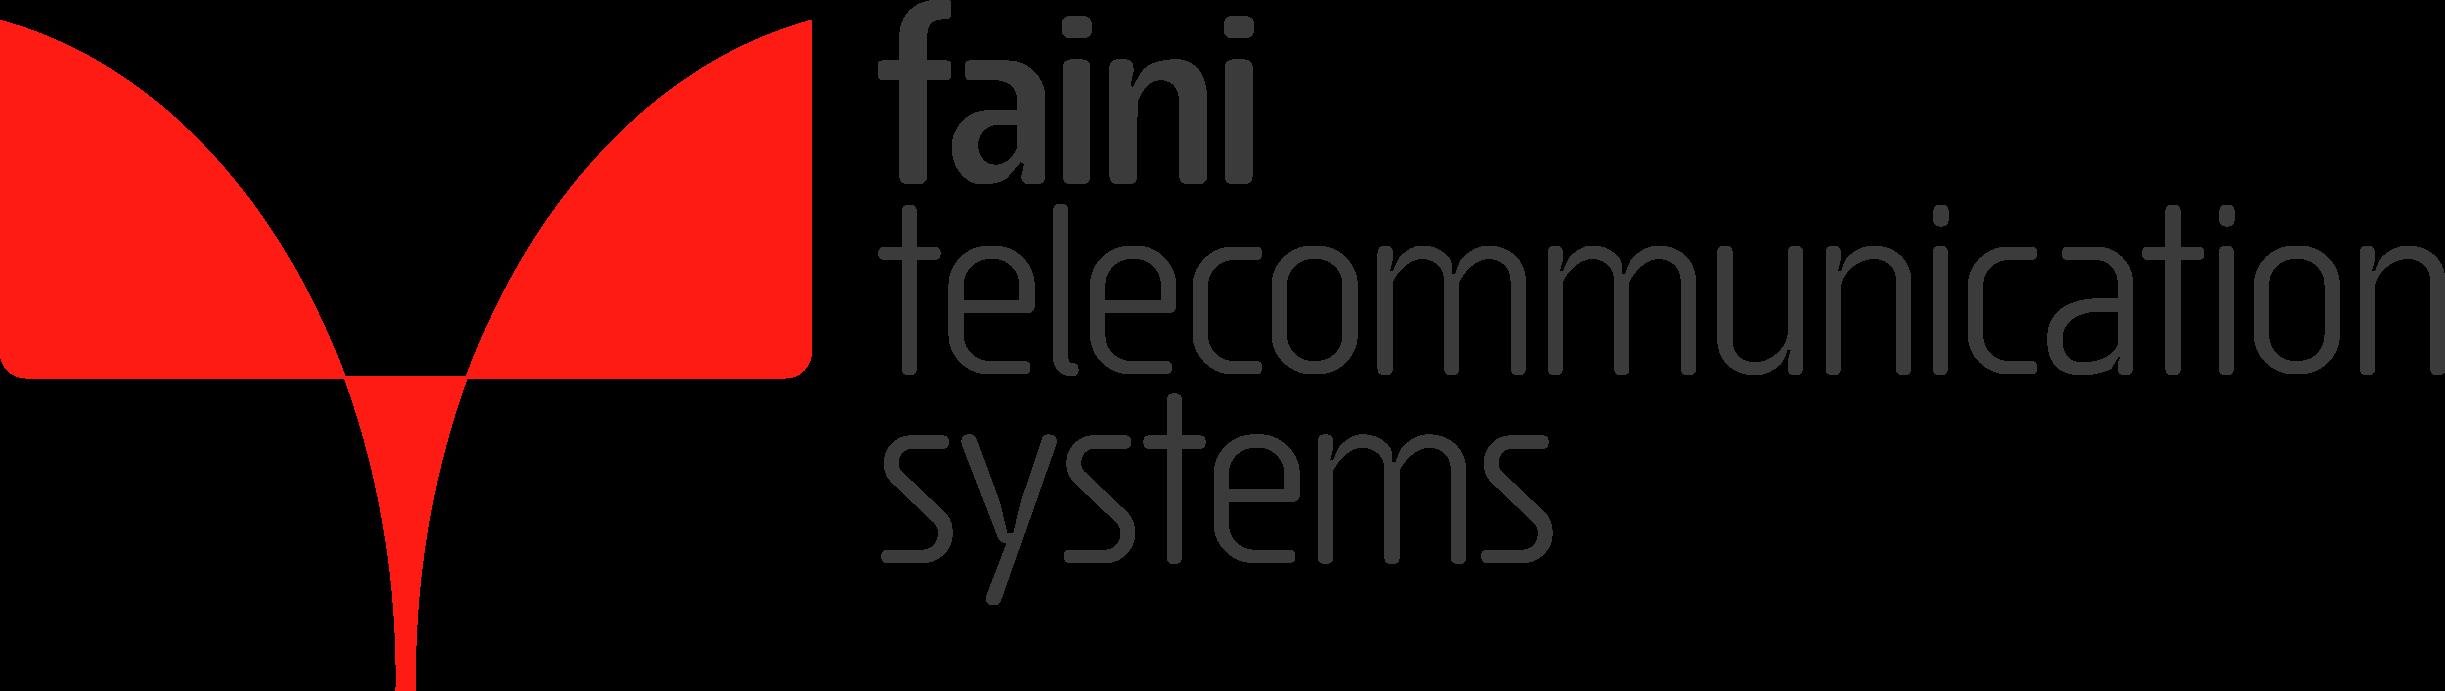 Faini Telecommunication Systems